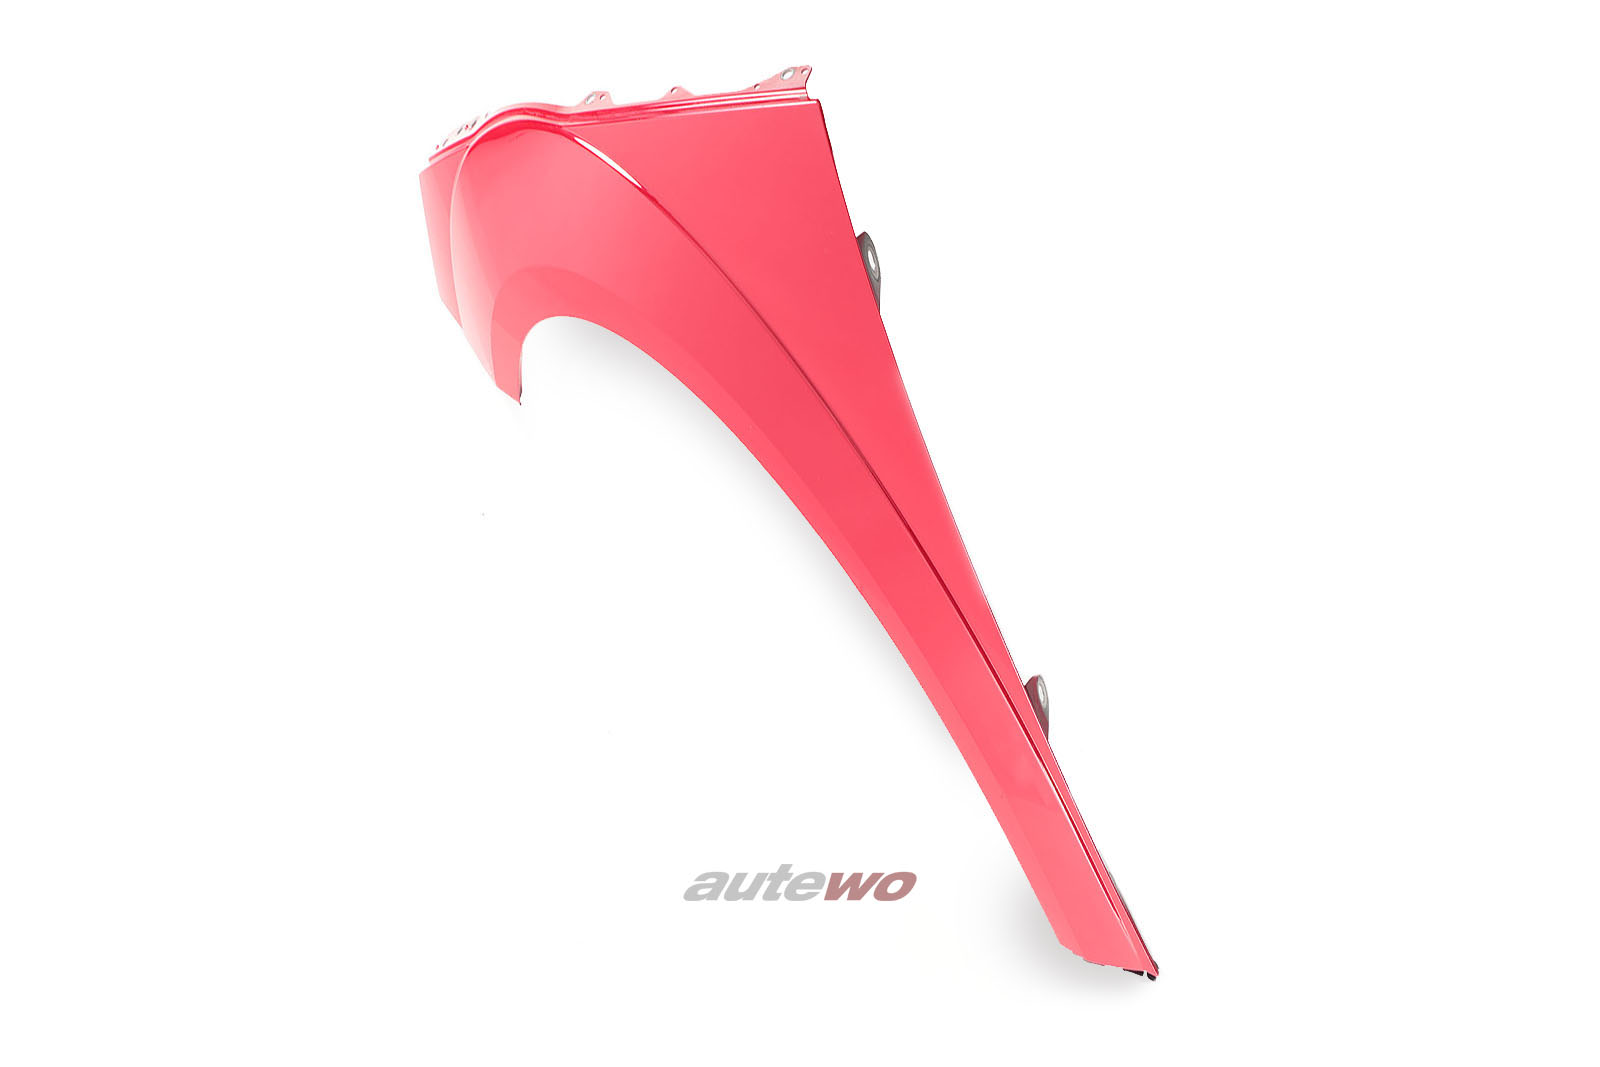 8S0821021 8S0821117A Audi TT 8S Kotflügel vorne links LY3U Tangorot-metallic